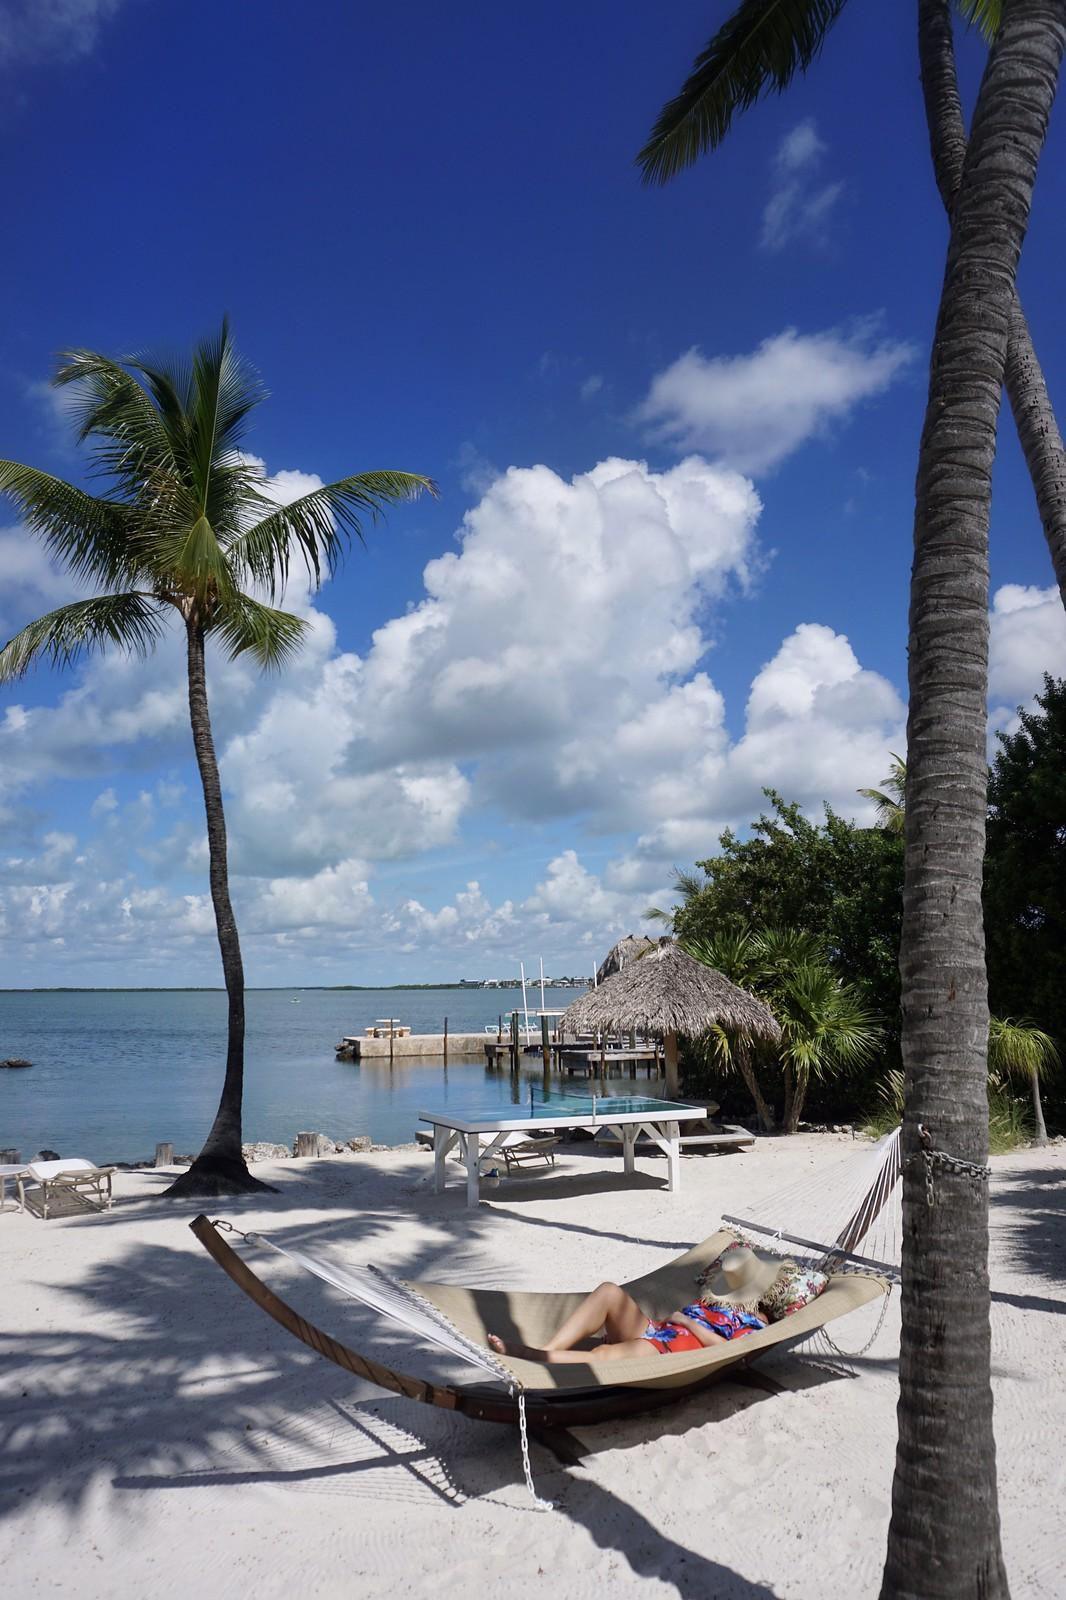 hammock-nap-ultimate-road-trip-5-days-florida-keys-itinerary-what-to-do-key-west-key-largo-islamorada-marathon-miami-vacation-guide